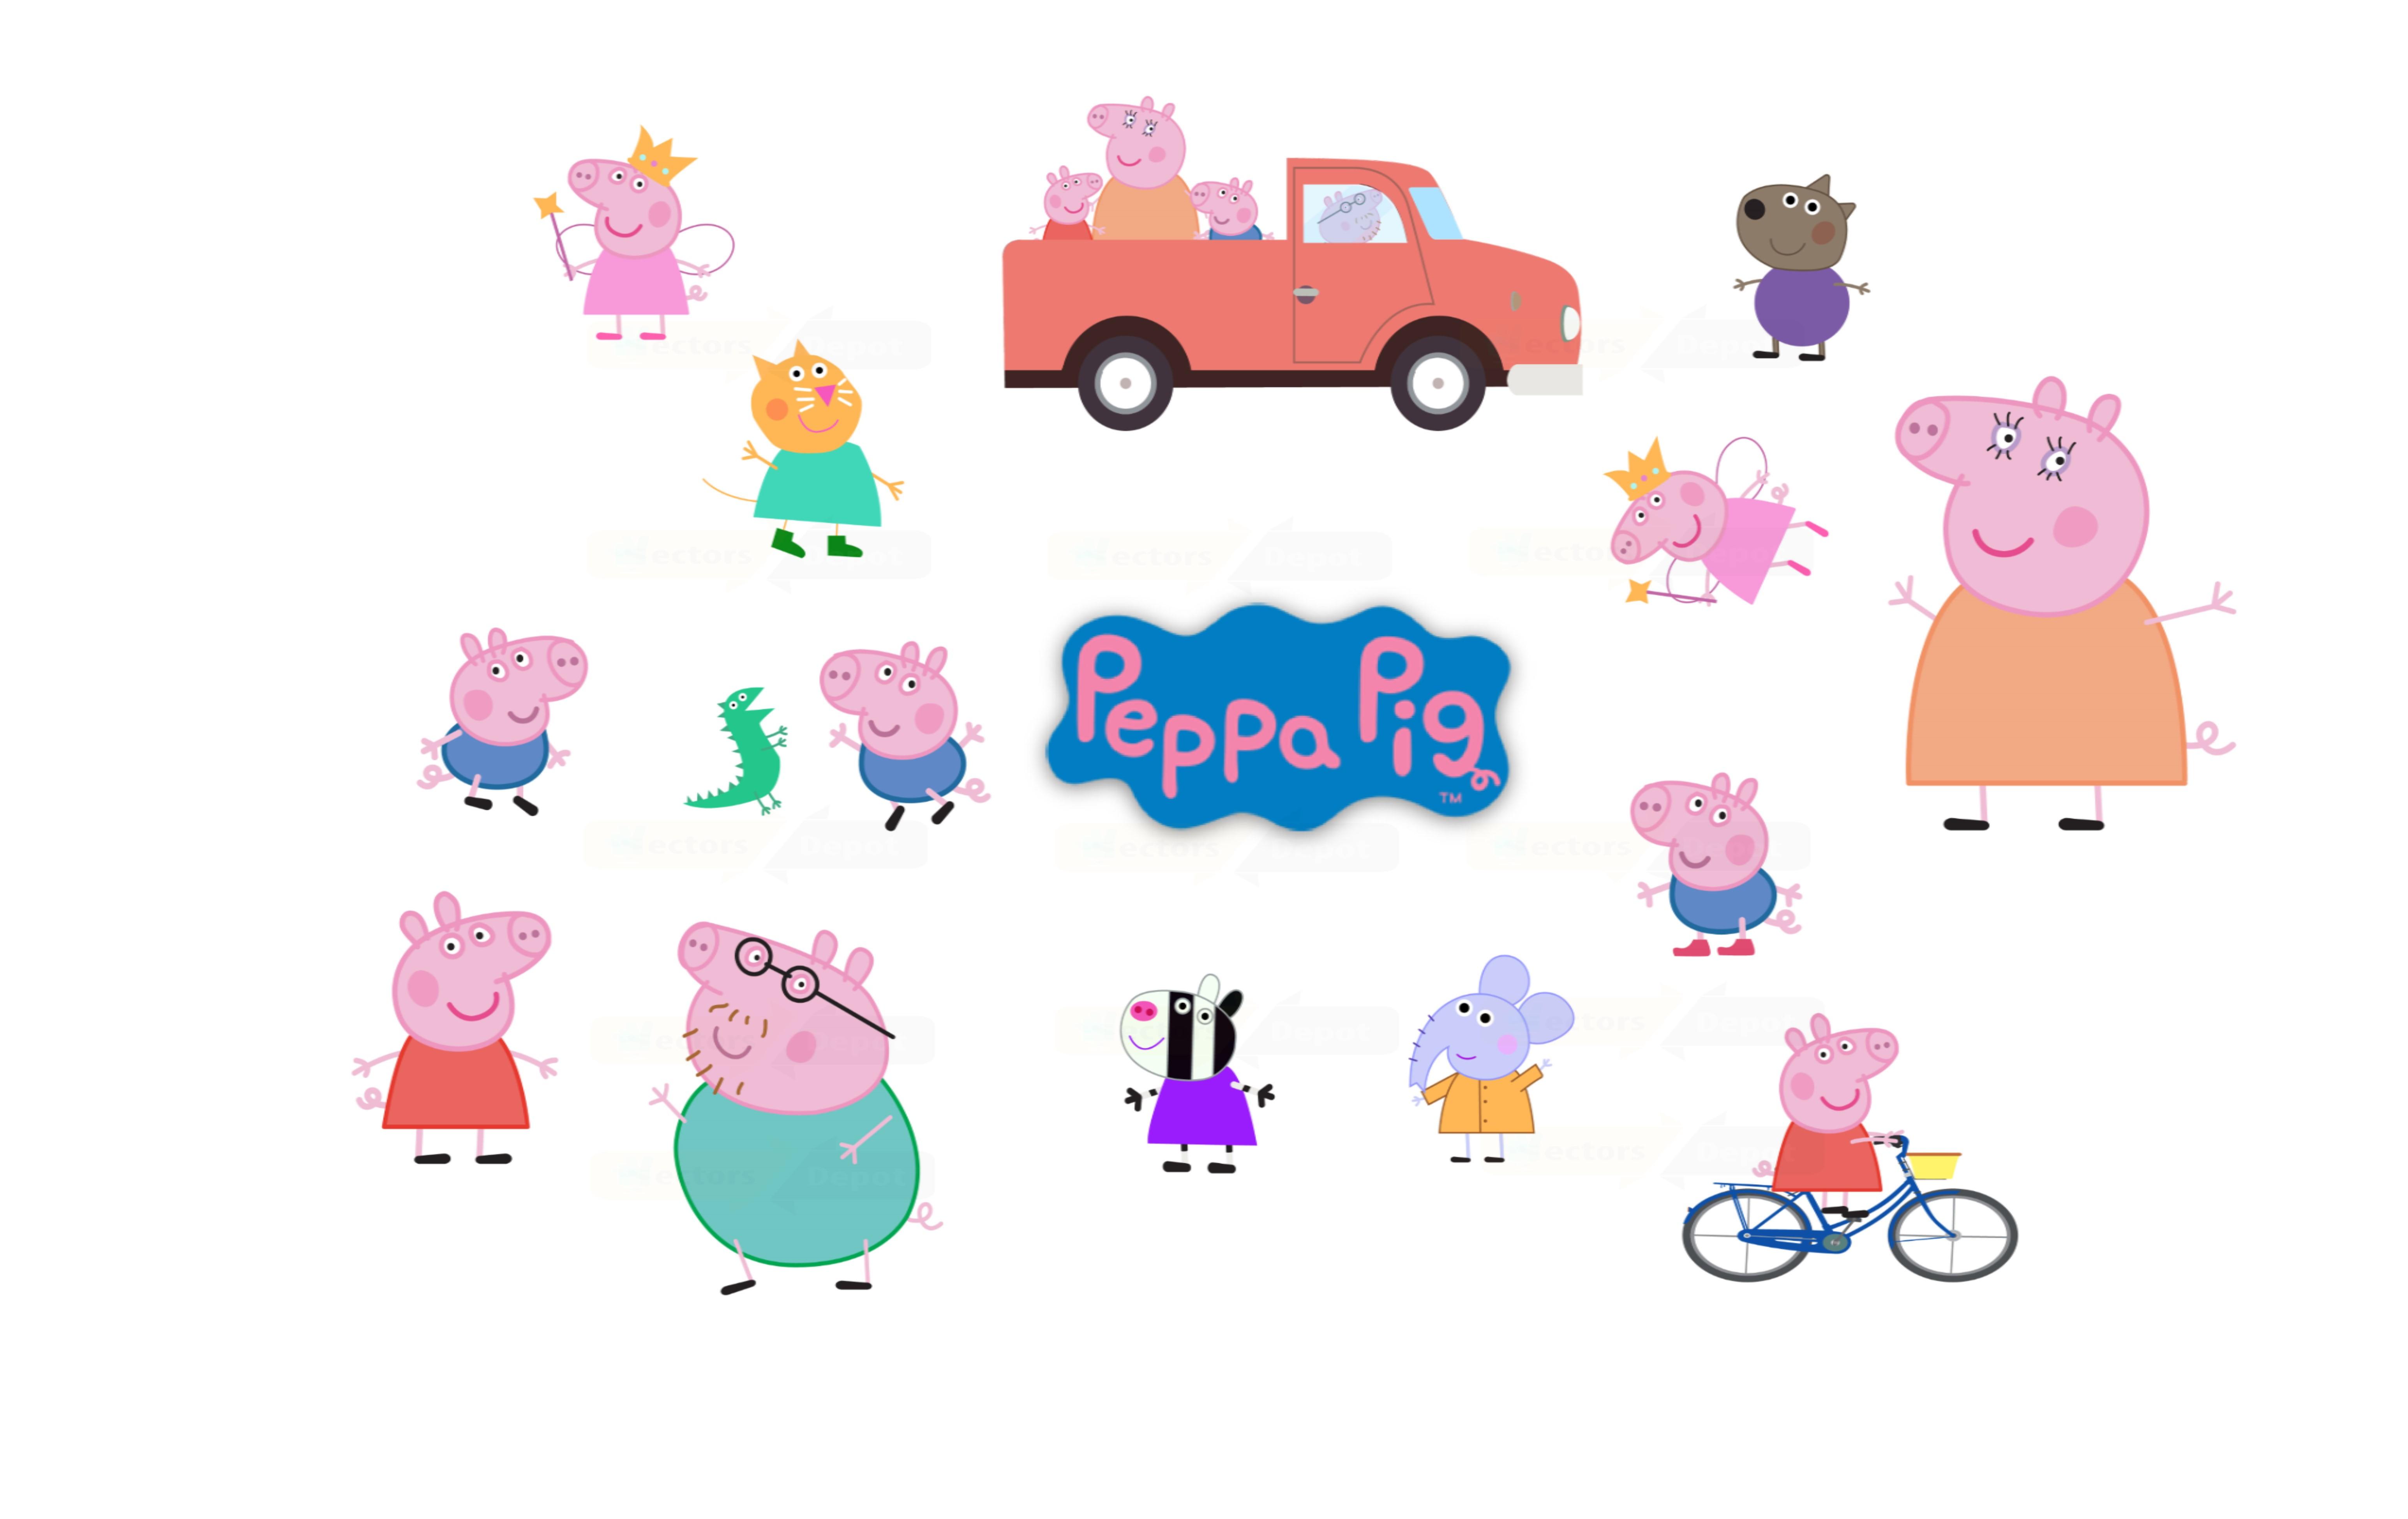 Peppa pig family illustration vector pack vectorsdepot peppa pig family illustration vector pack voltagebd Images